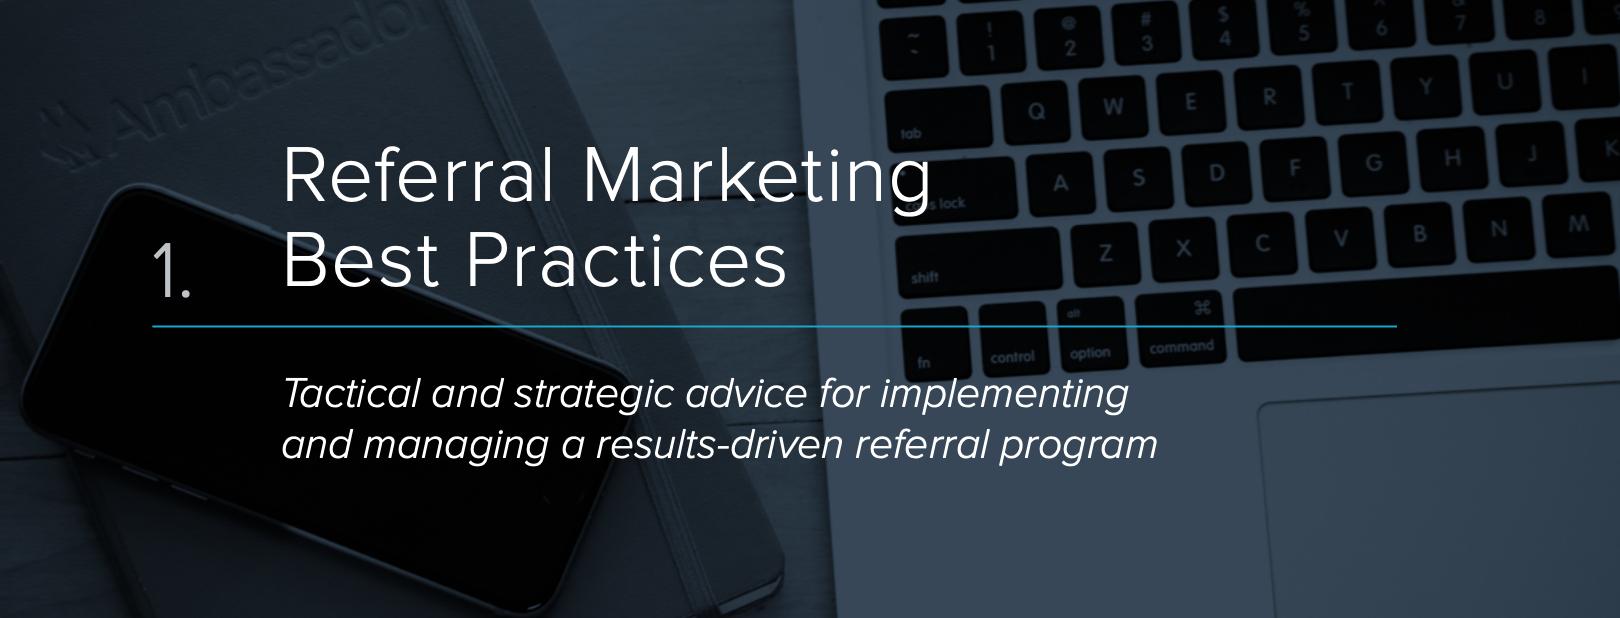 Referral Marketing Best Practices